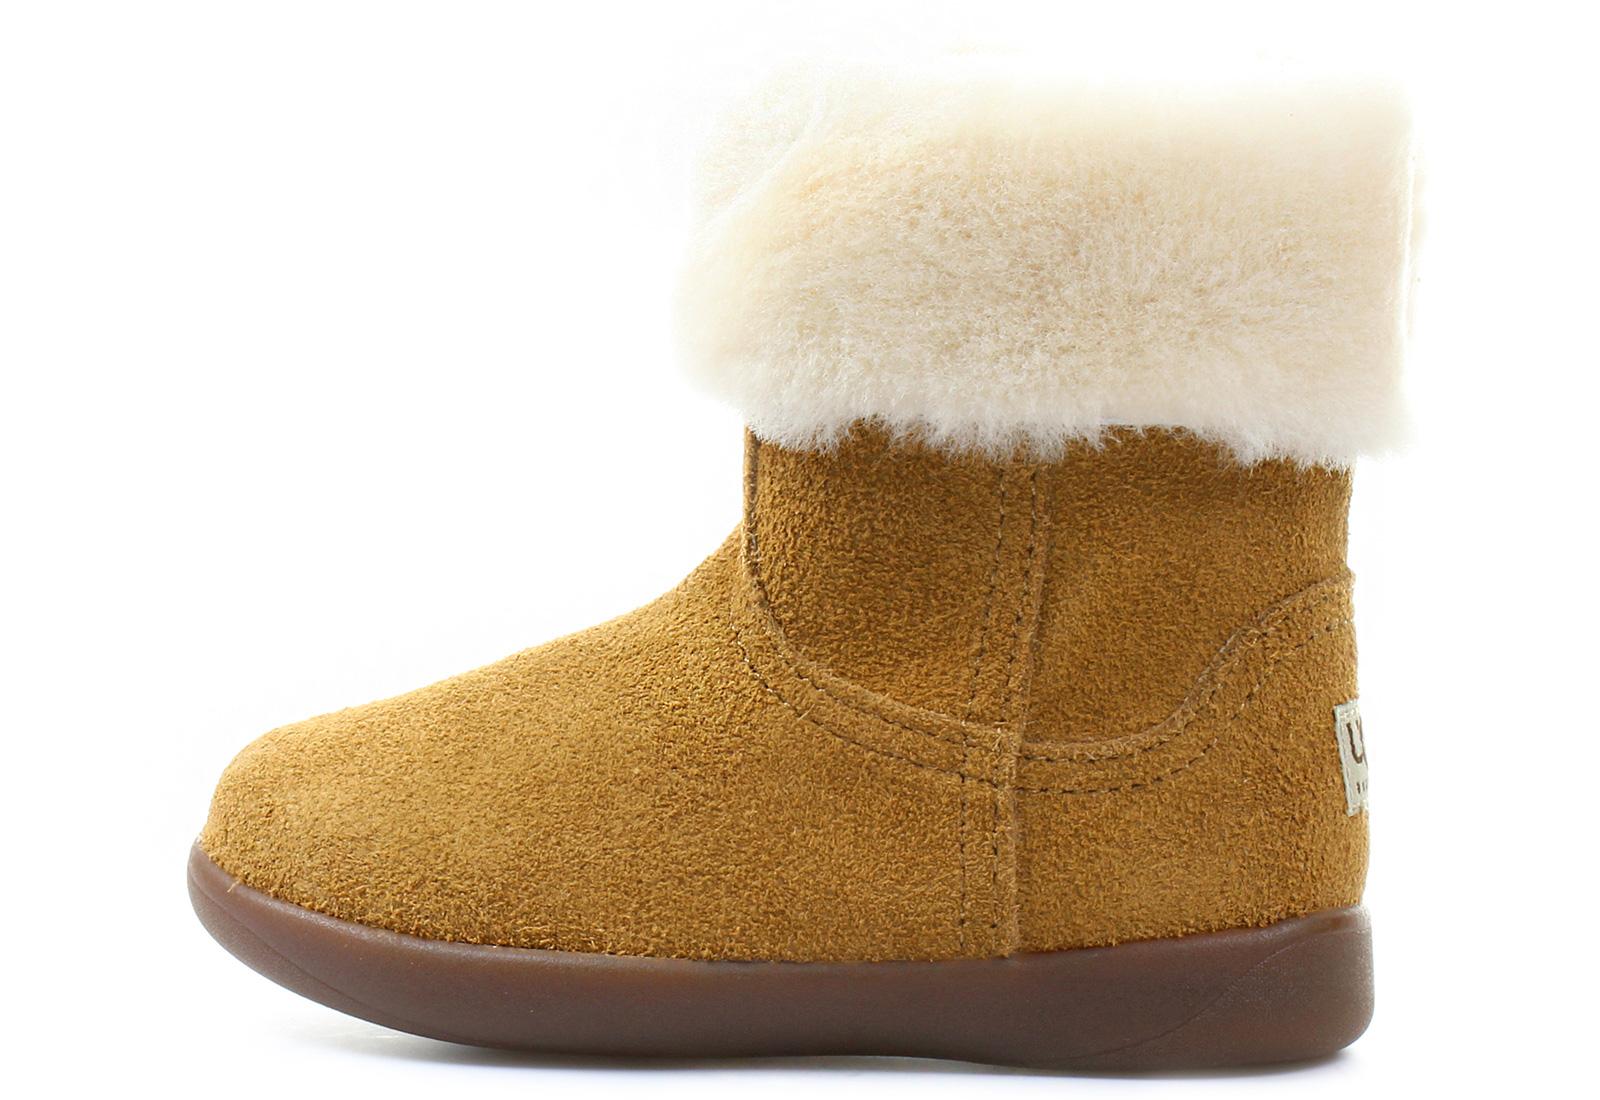 Ugg Csizma - Jorie Ii - 1003656t-che - Office Shoes Magyarország e1cad22590